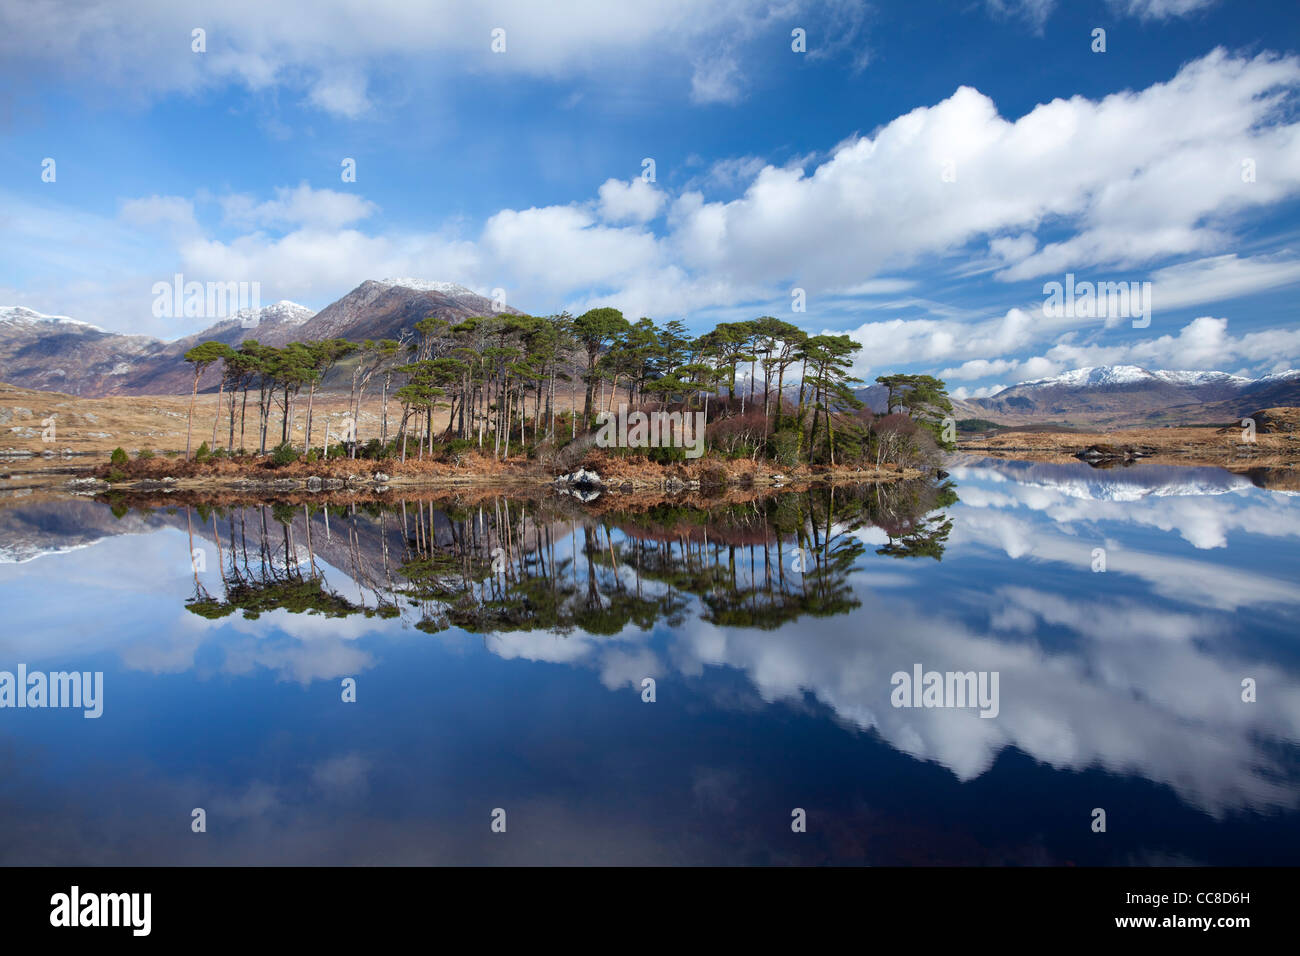 Winter reflection of the Twelve Bens in Derryclare Lough, Connemara, County Galway, Ireland. - Stock Image